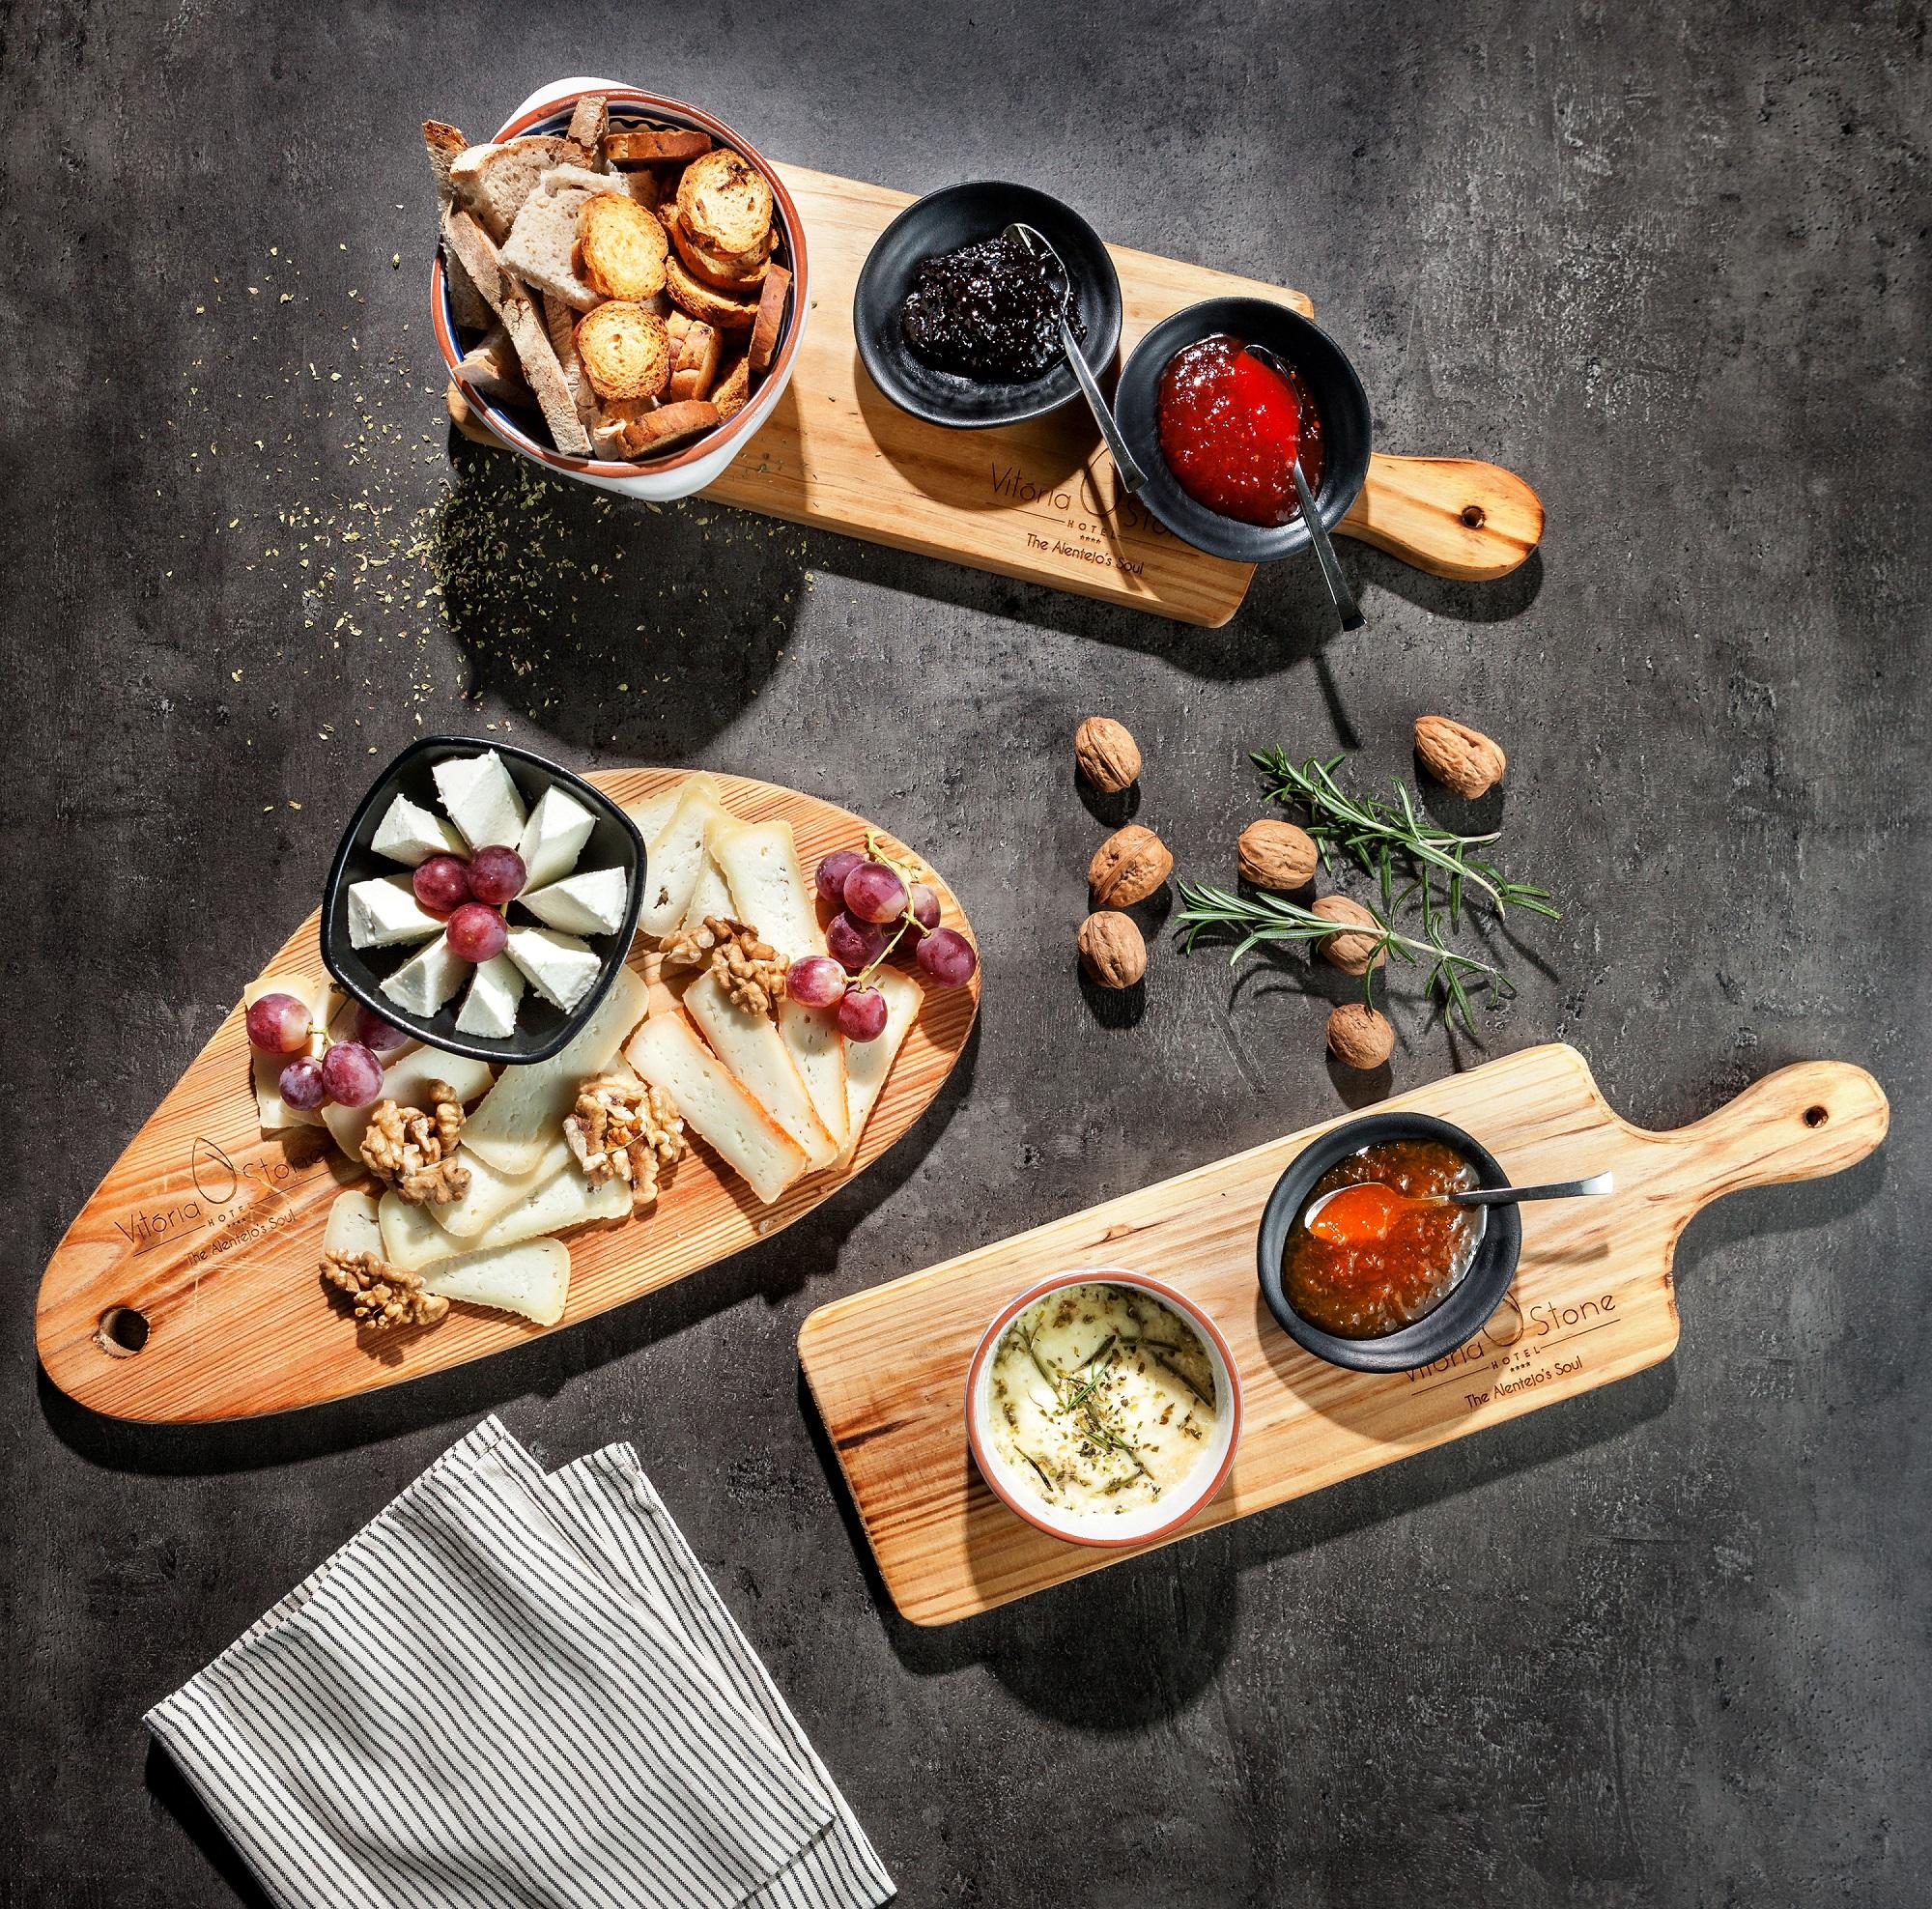 Vitoria Stone Hotel - Gastronomia & Vinhos